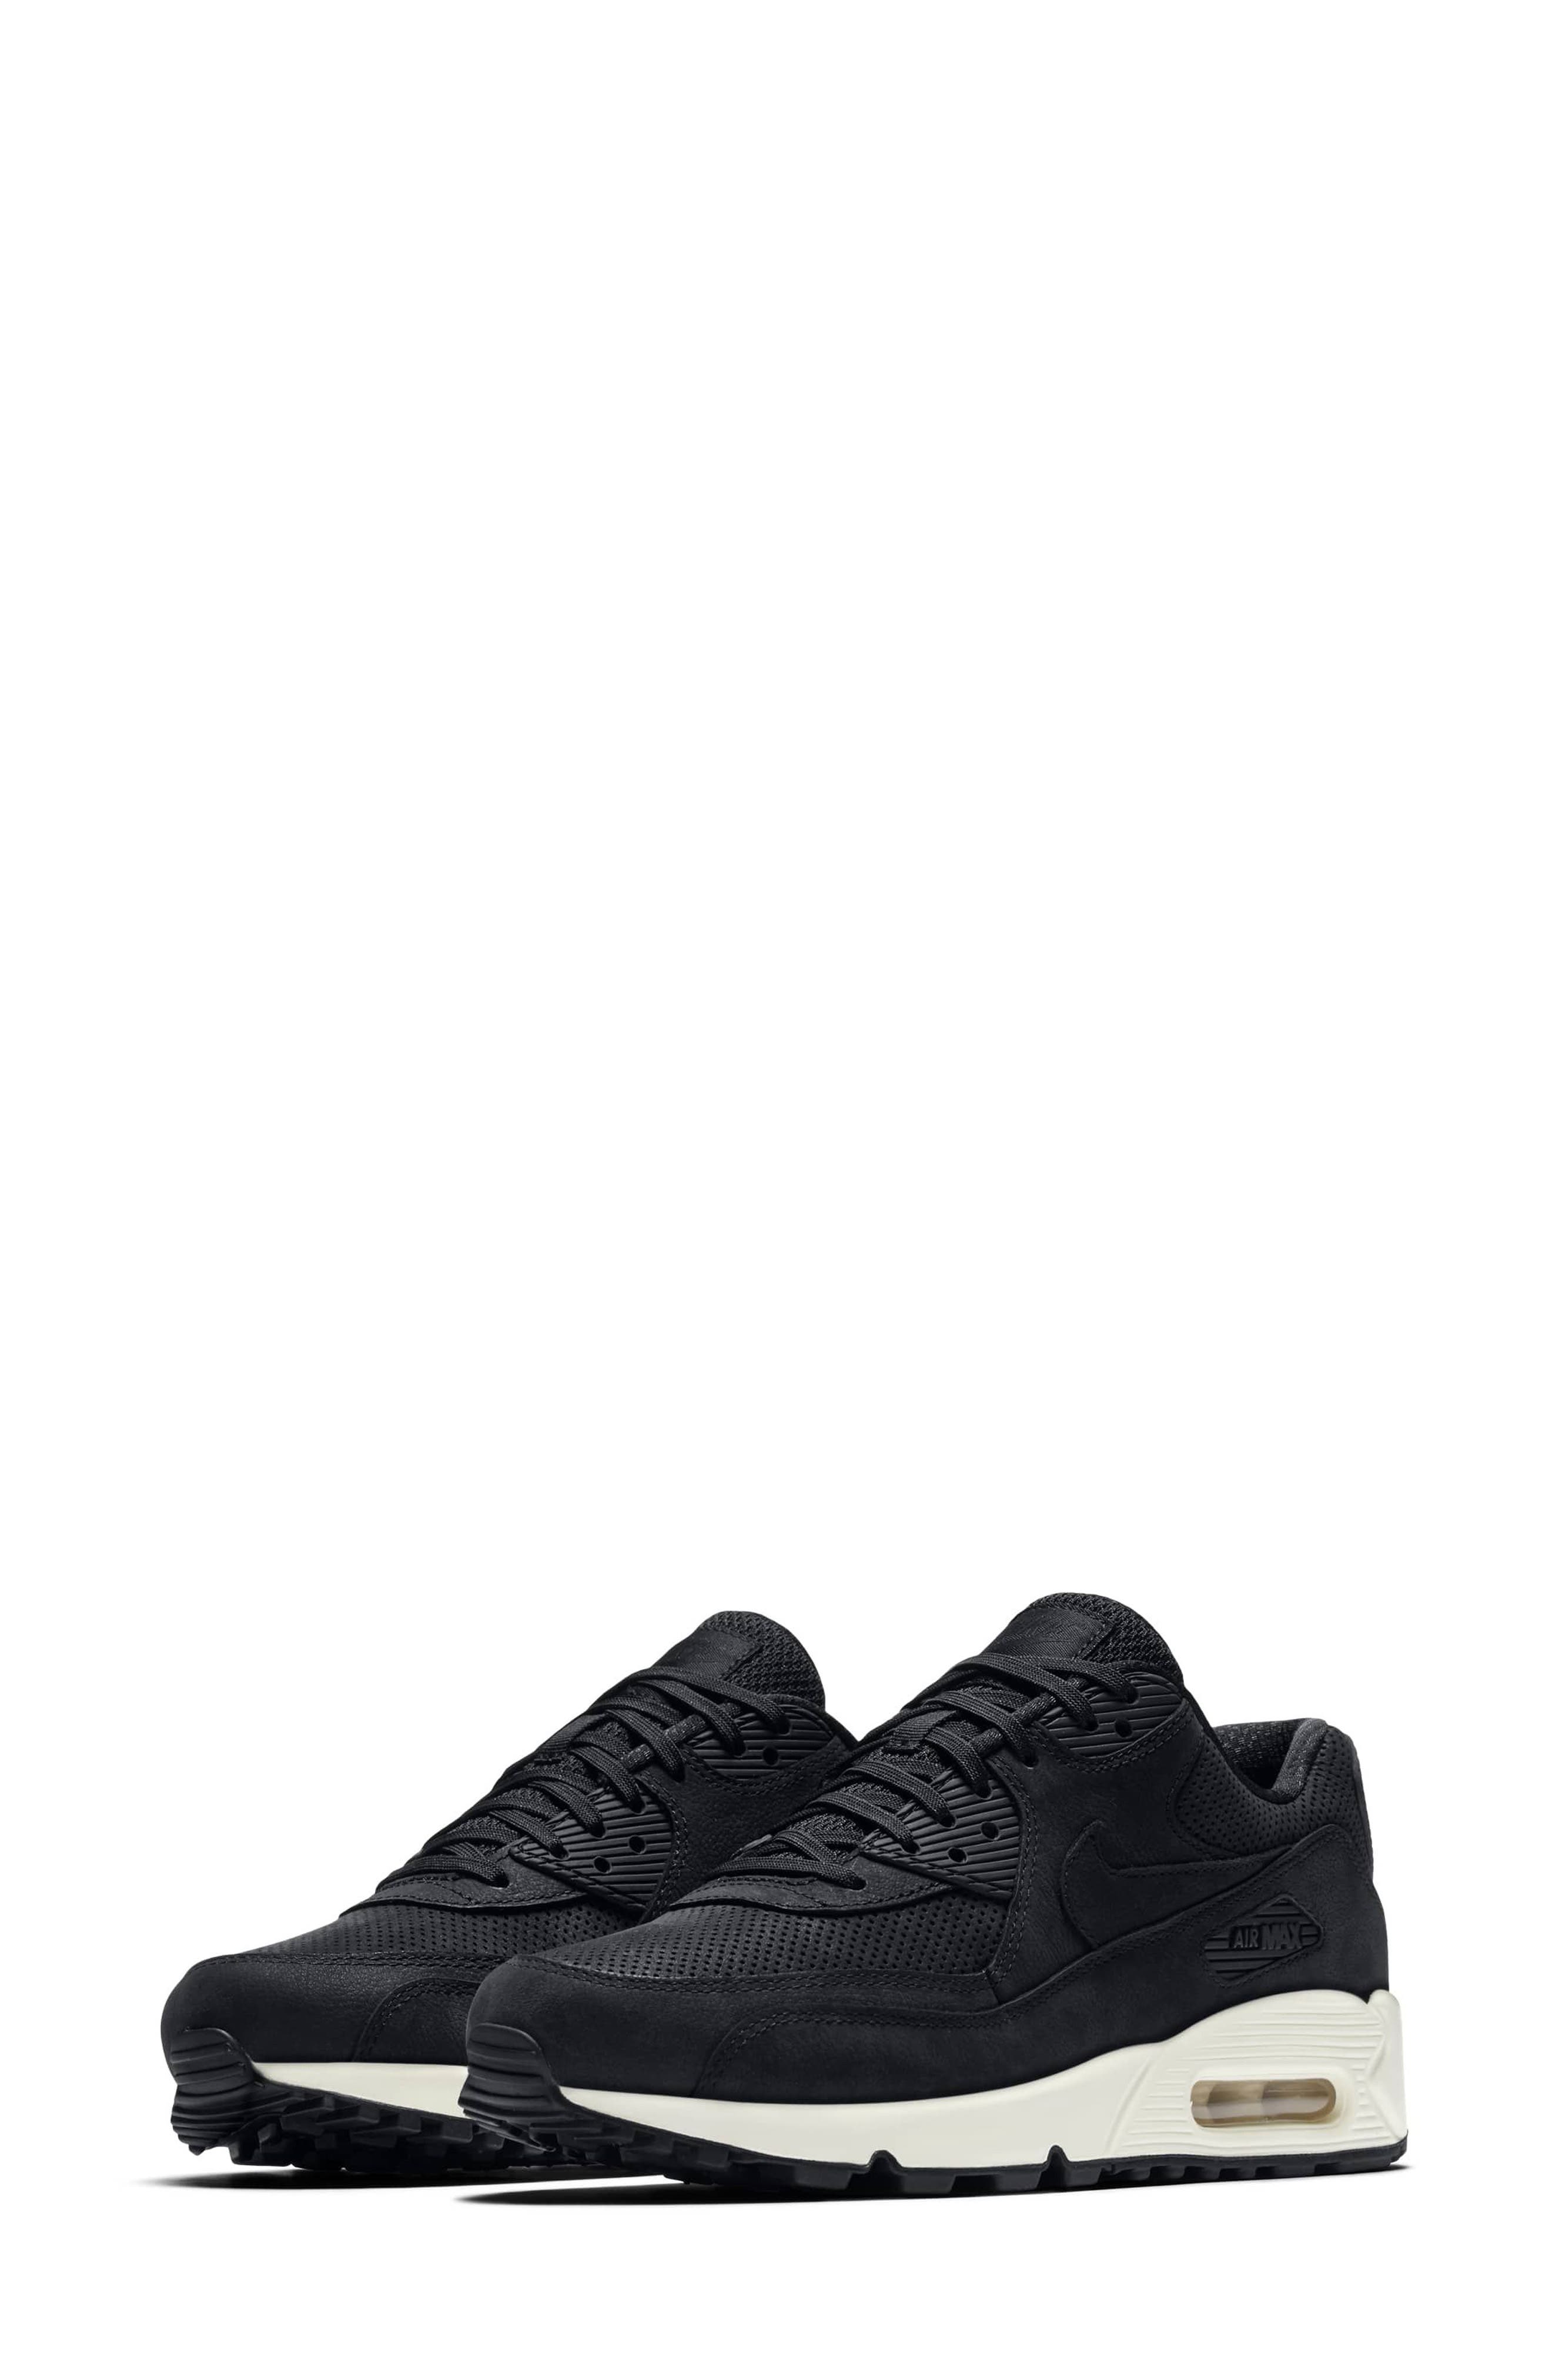 Air Max 90 Pinnacle Sneaker,                             Main thumbnail 1, color,                             006